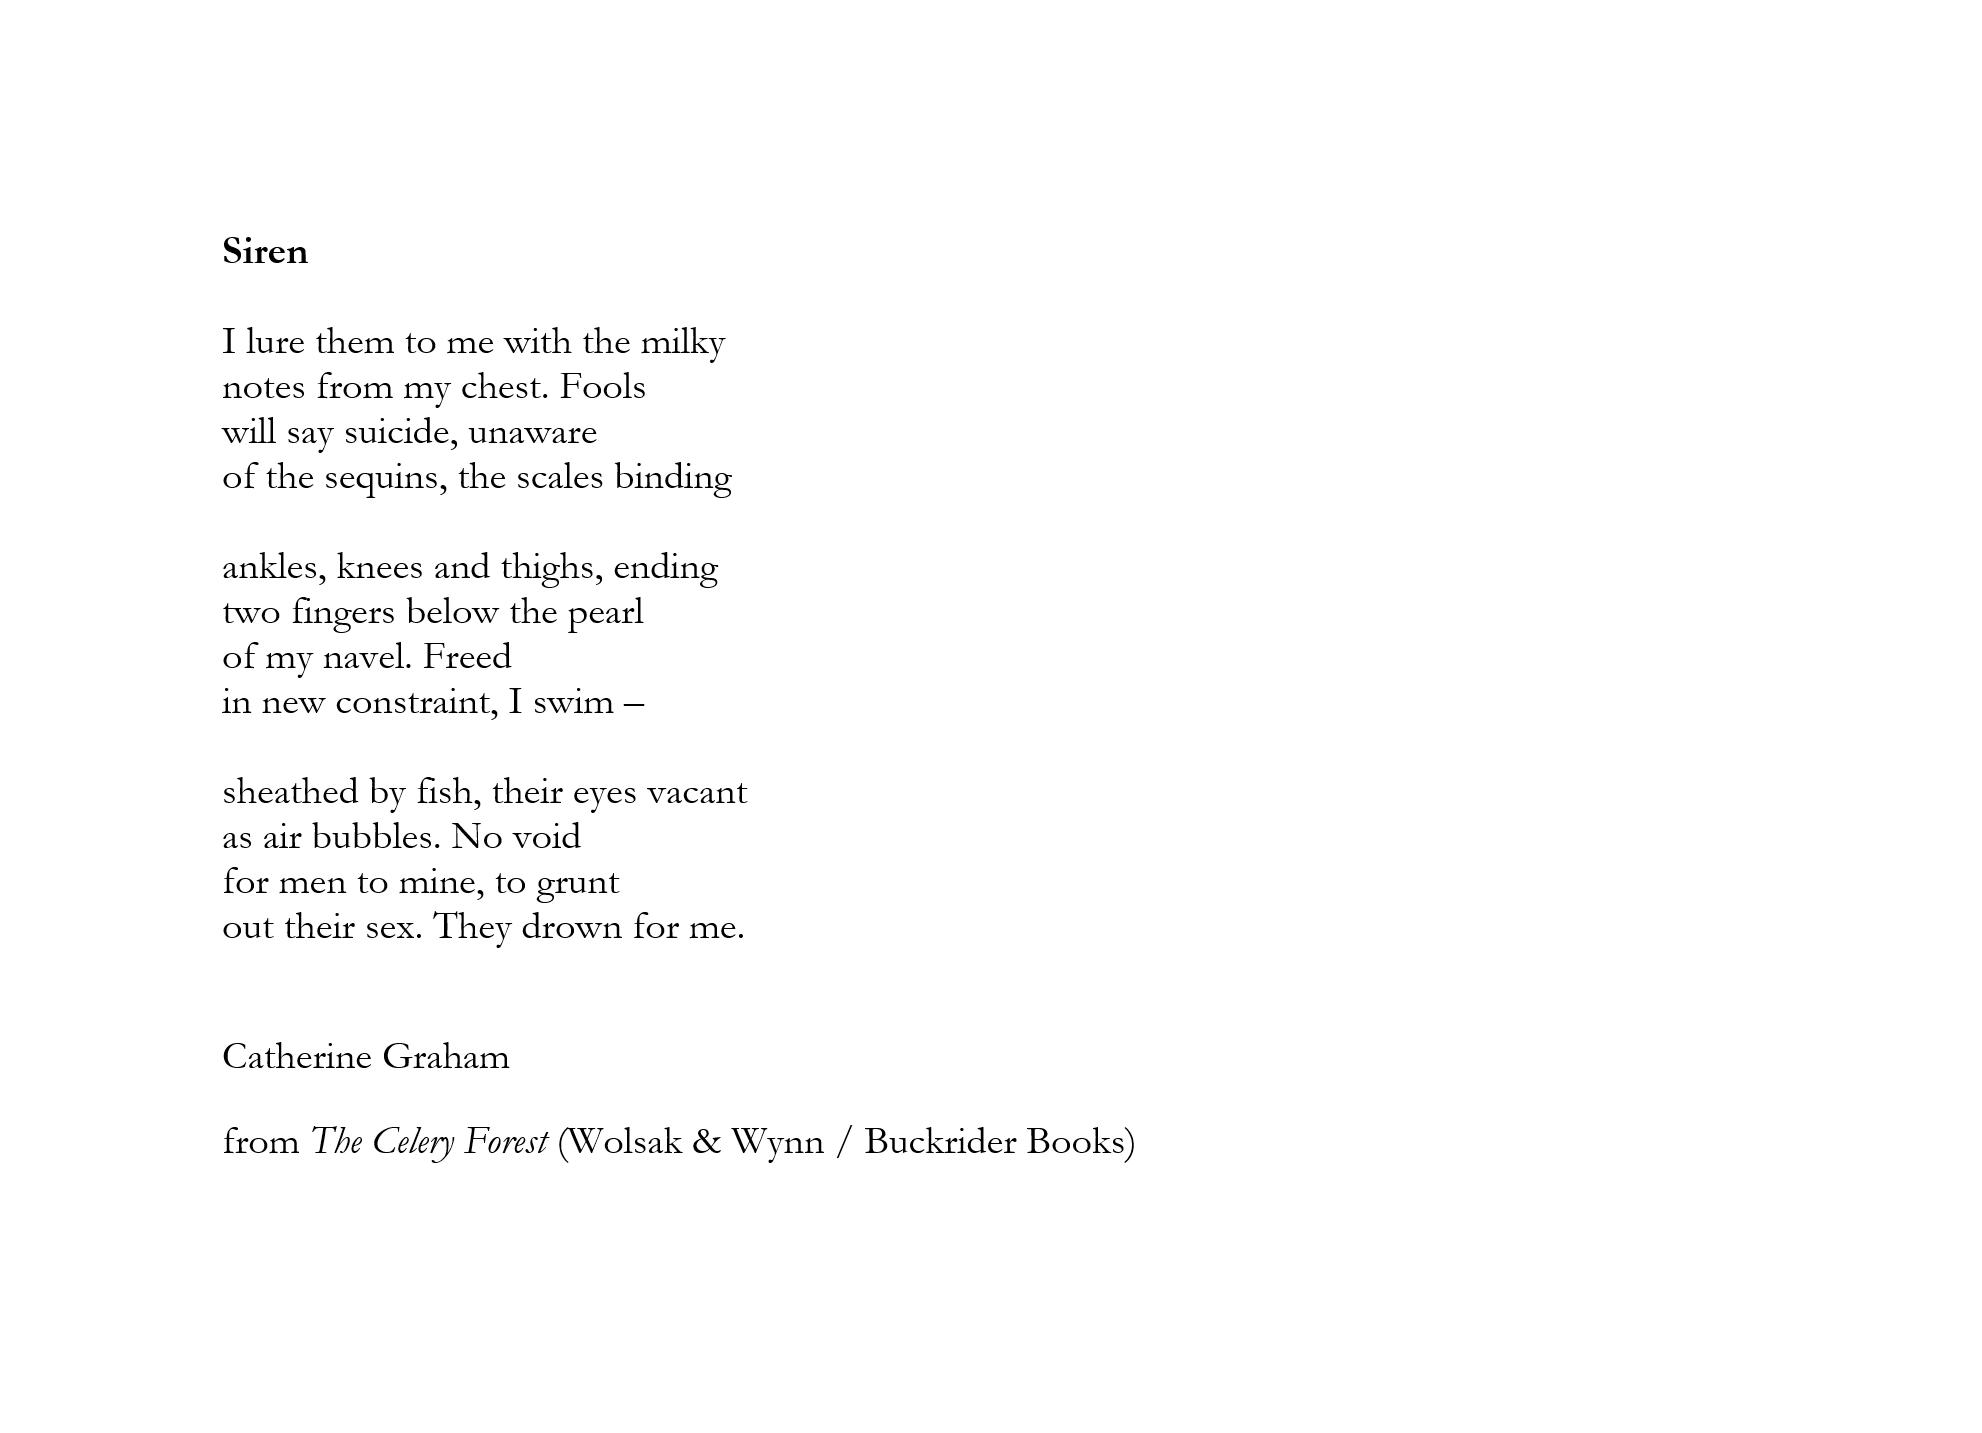 Siren by Catherine Graham